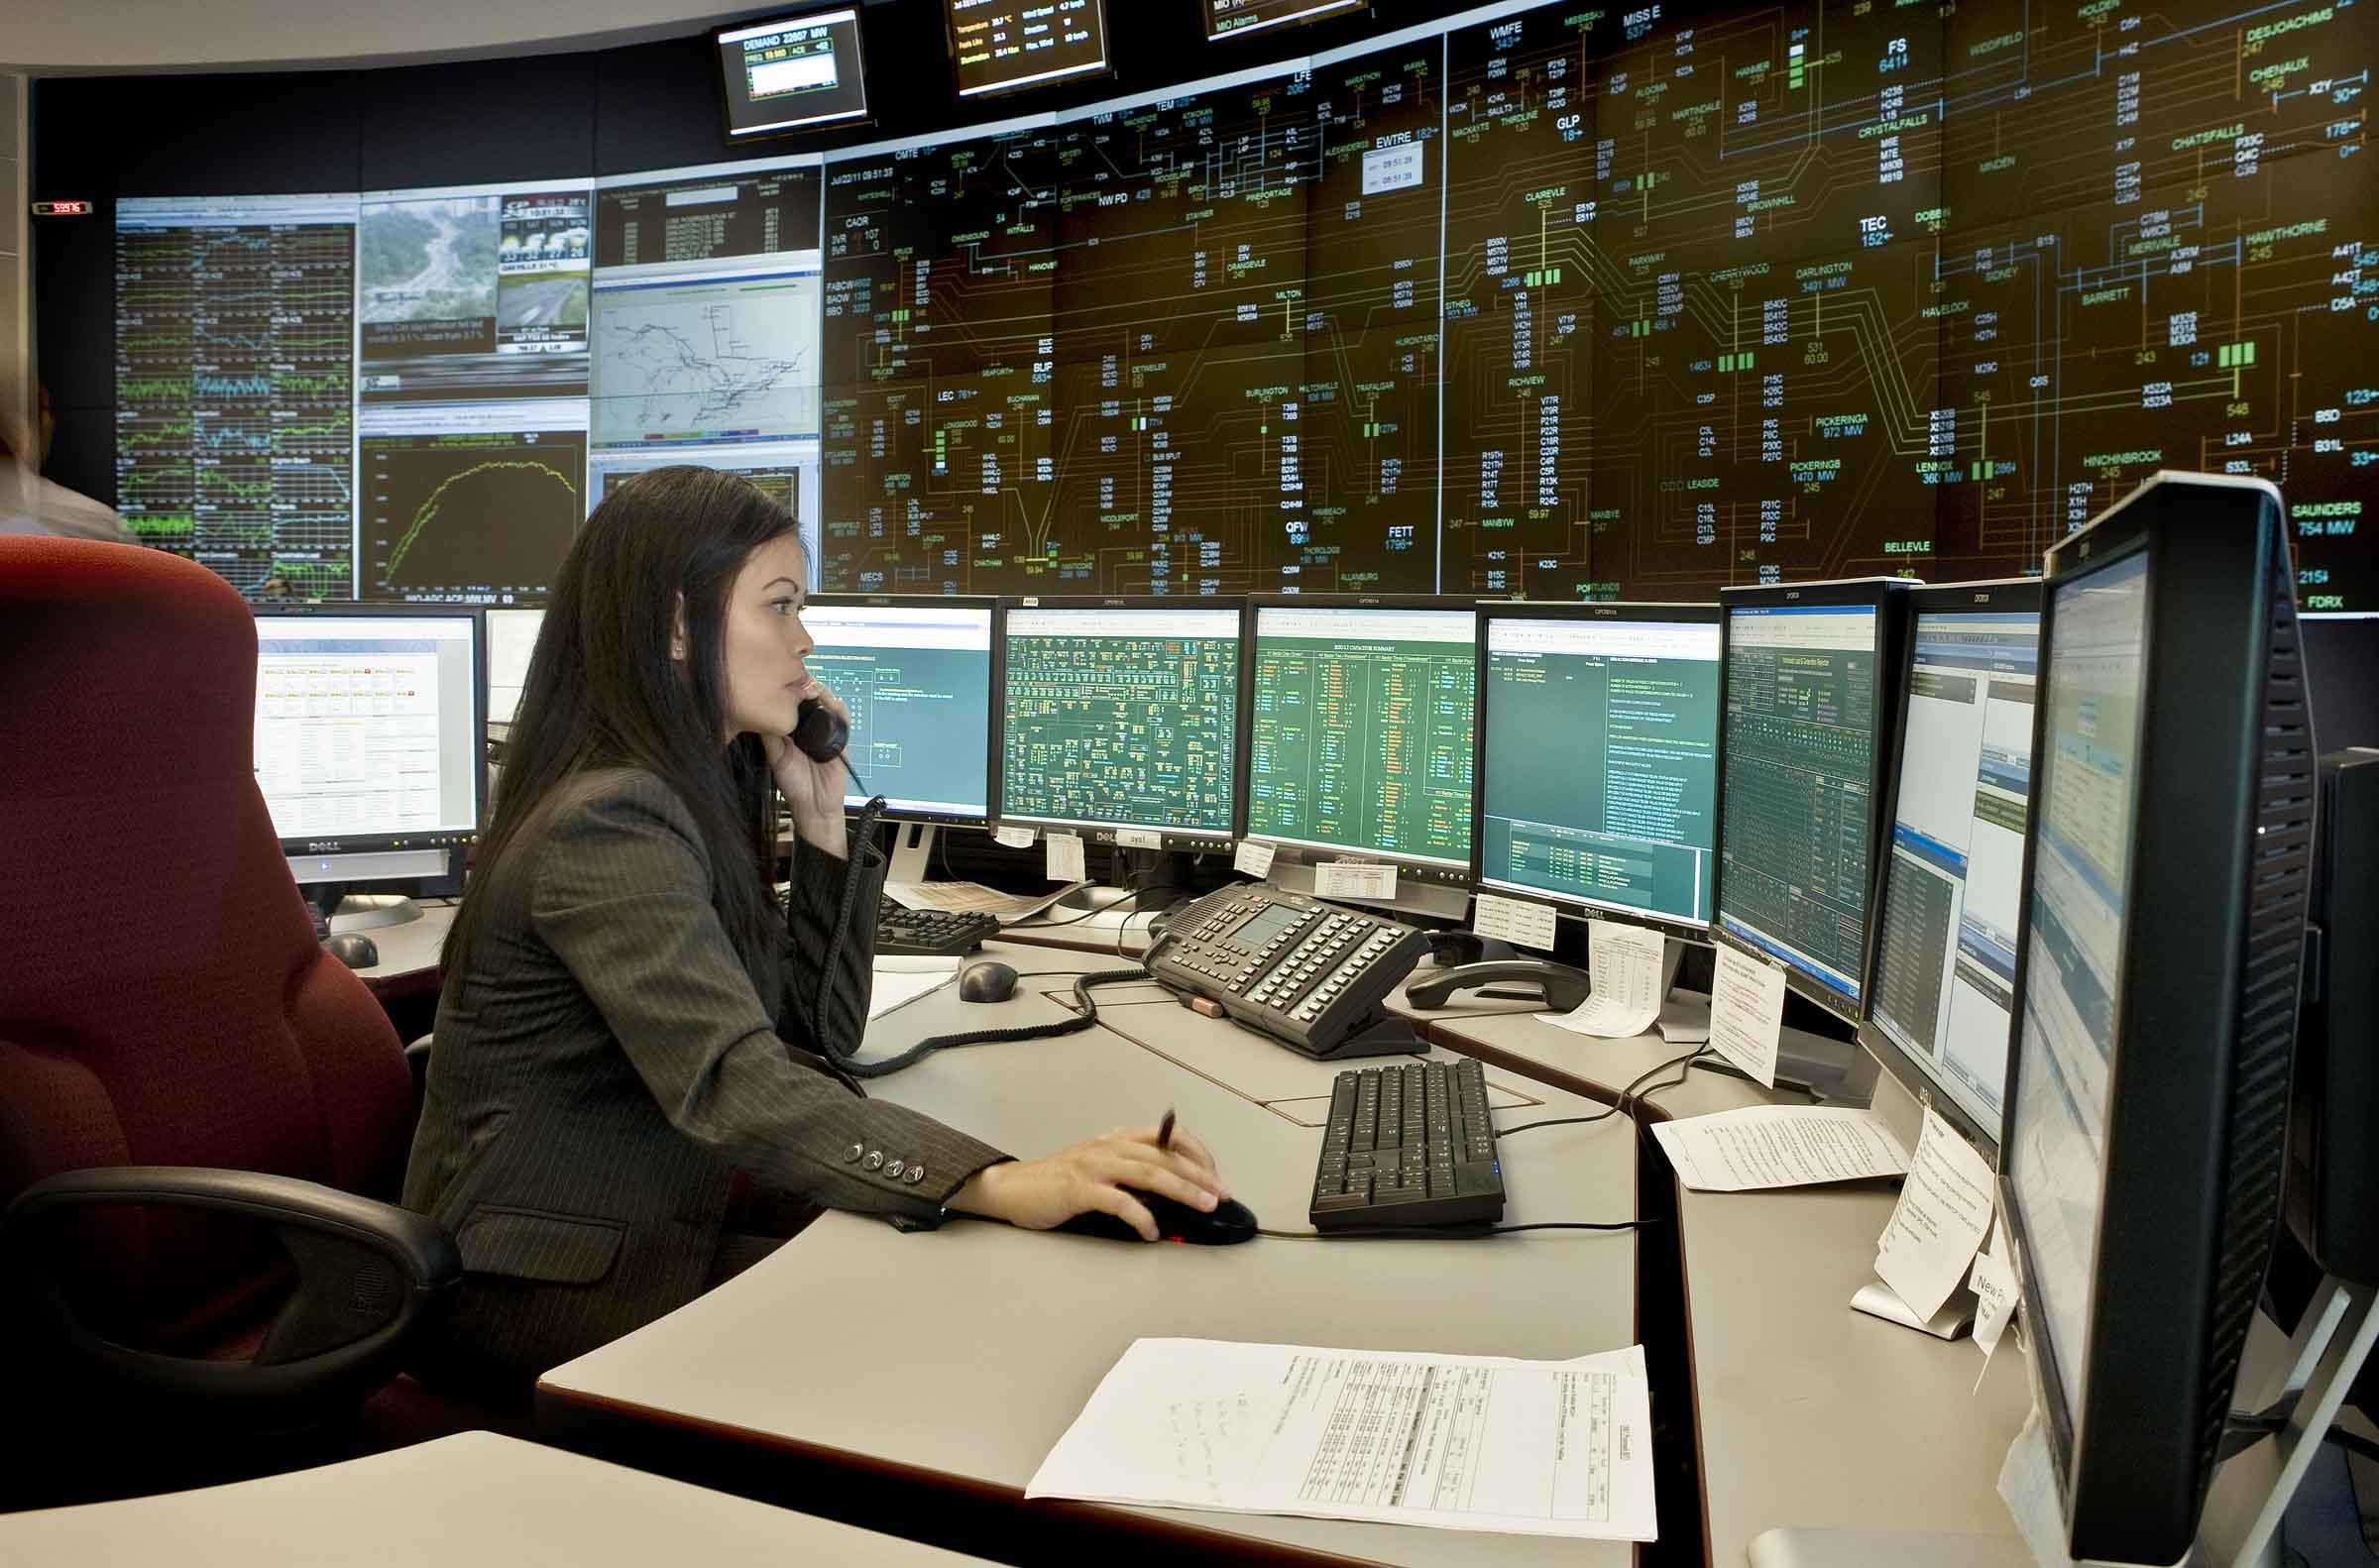 IESO controlroom2_full.jpg